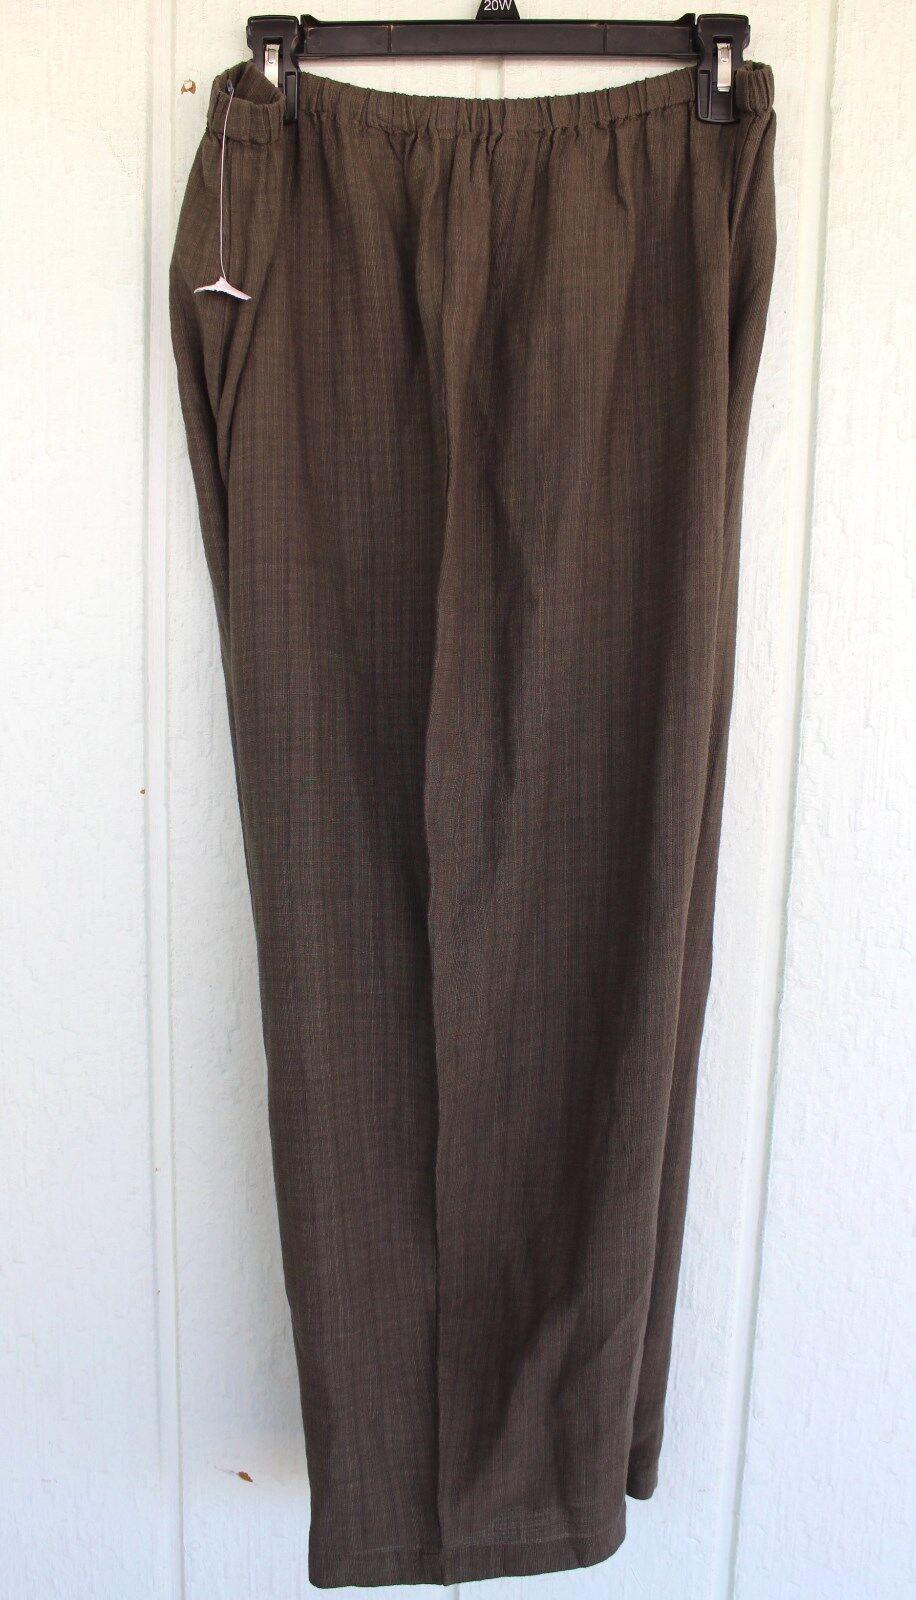 NWT EILEEN FISHER WOMAN 1X Taupe Washable Crepe Viscose Linen Capri Pants